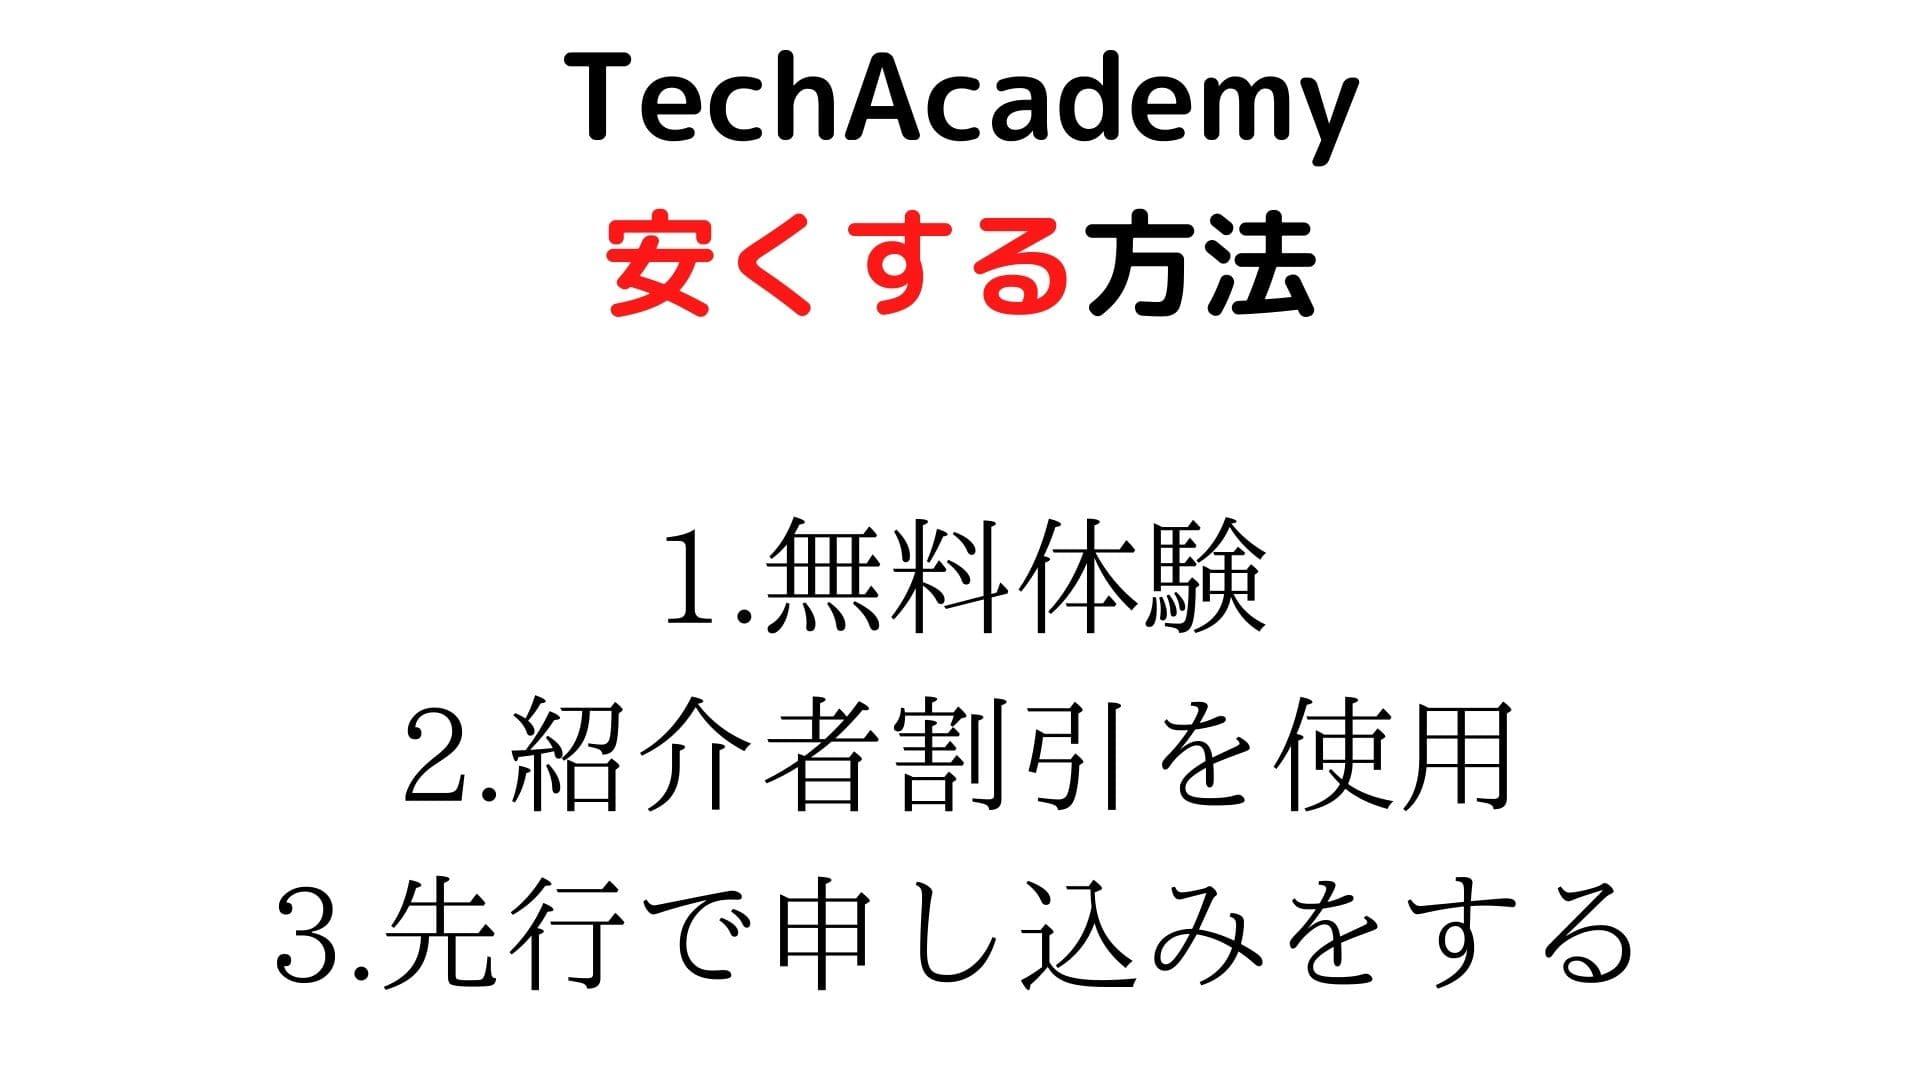 TechAcademy 価格